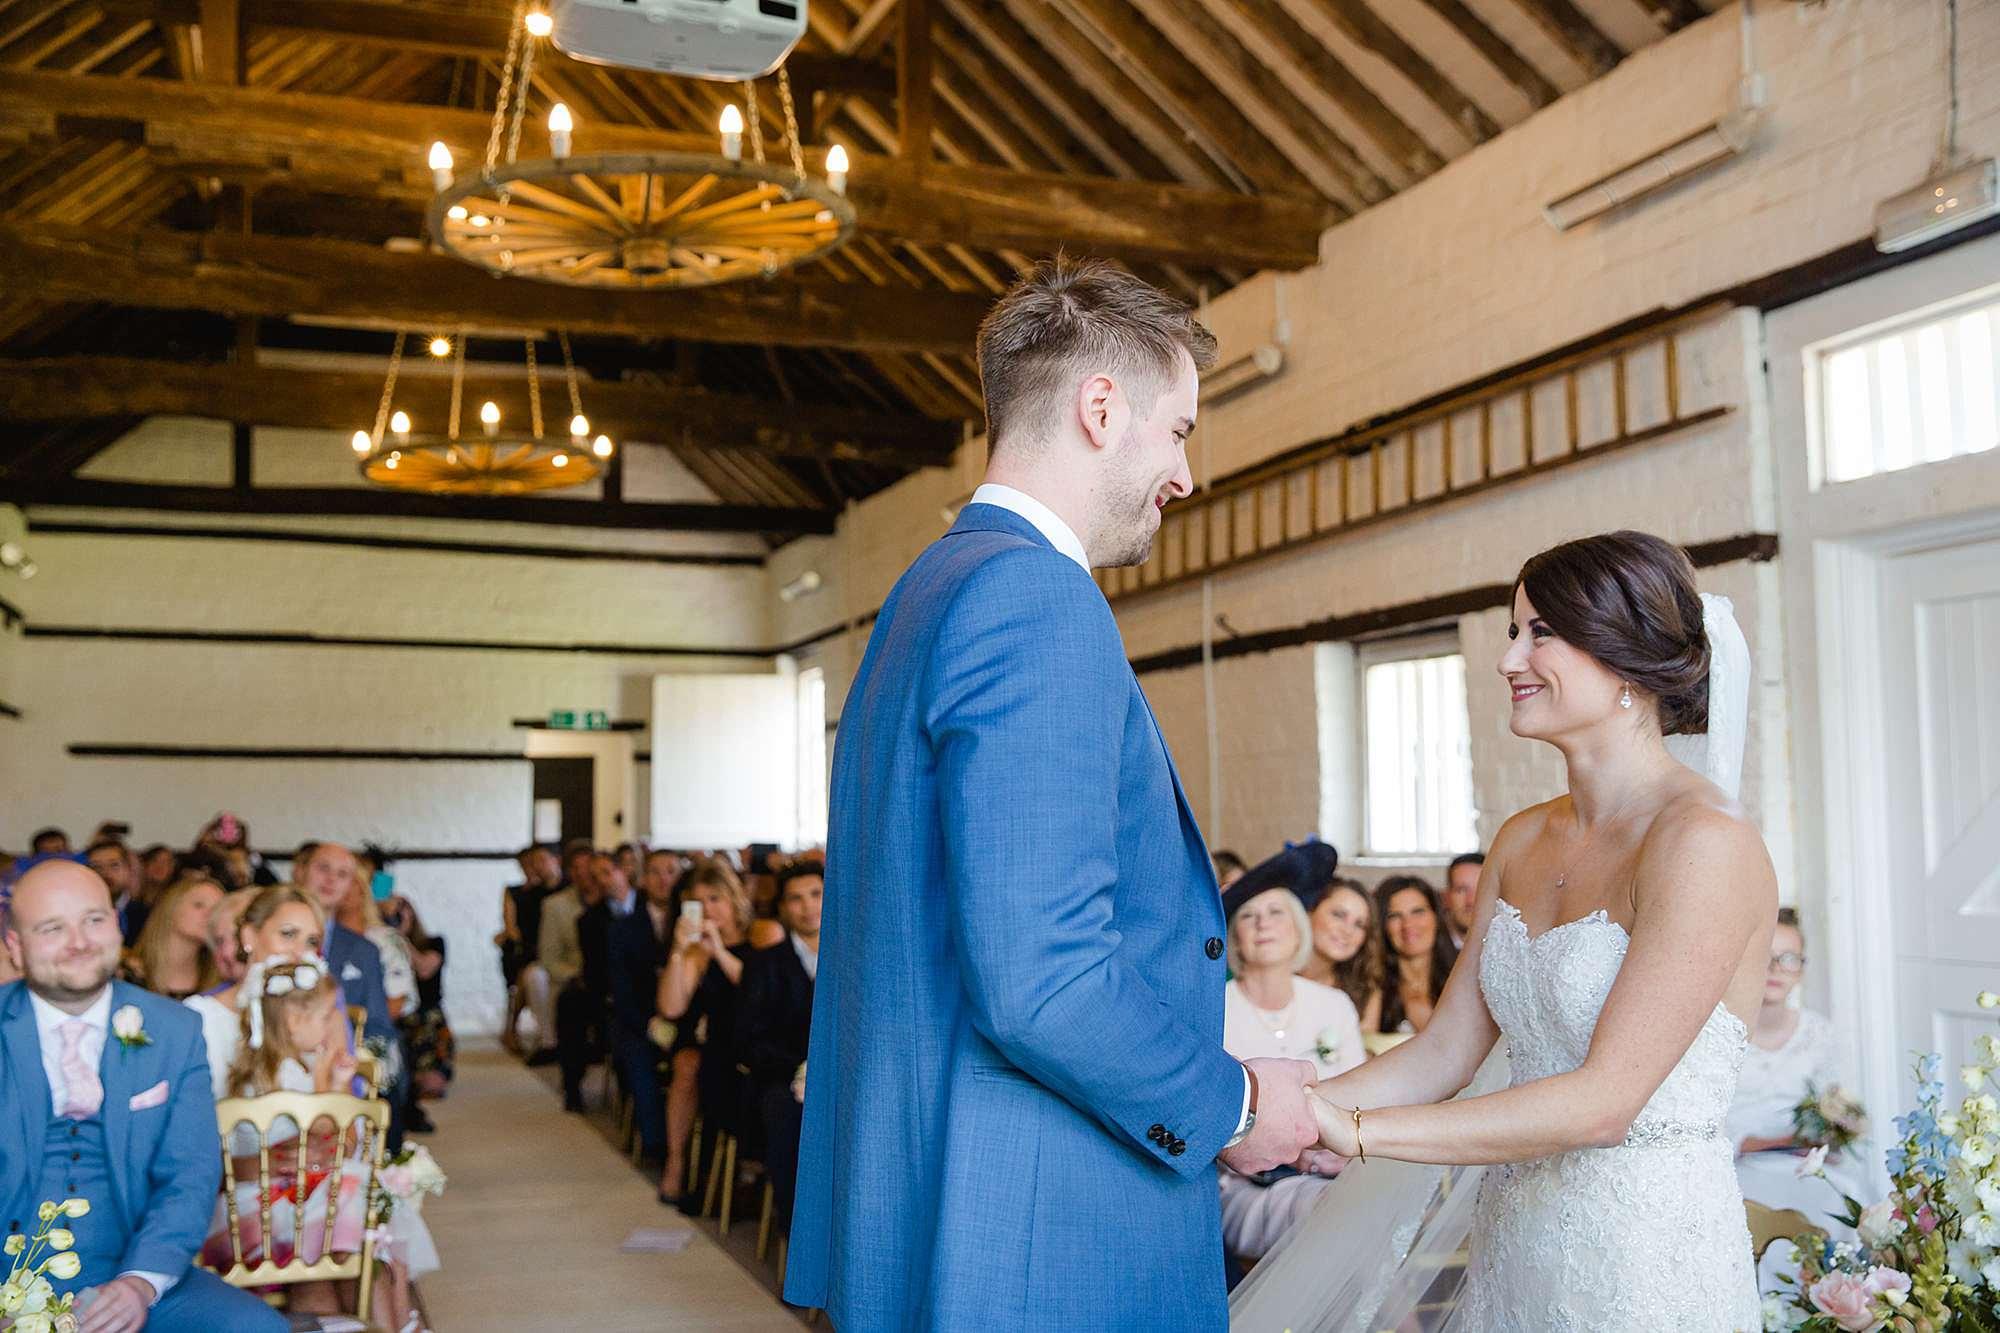 Lillibrooke Manor wedding bride and groom exchange vows